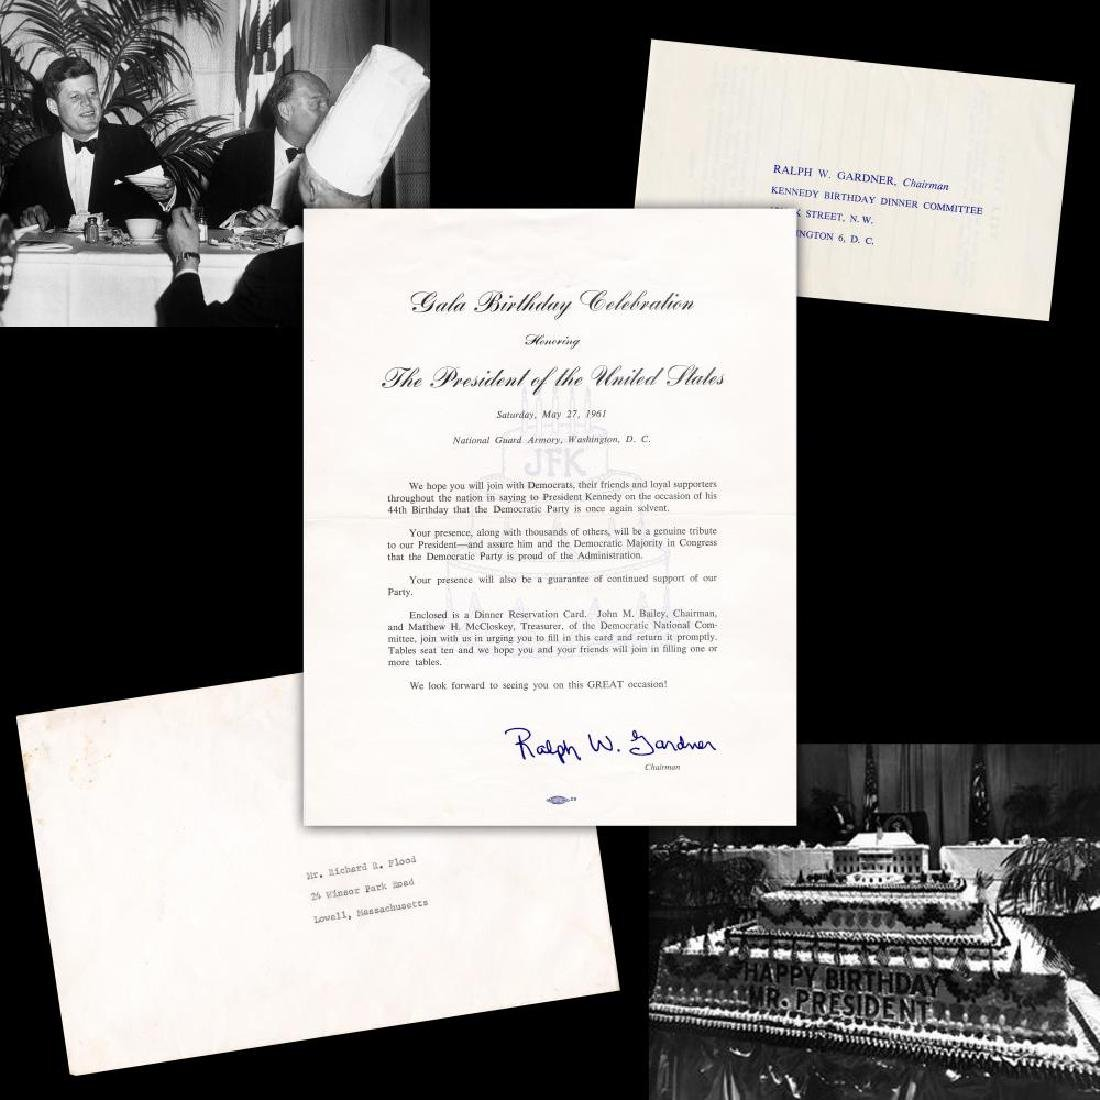 John F. Kennedy Invitation to 1961 Birthday Gala Hosted